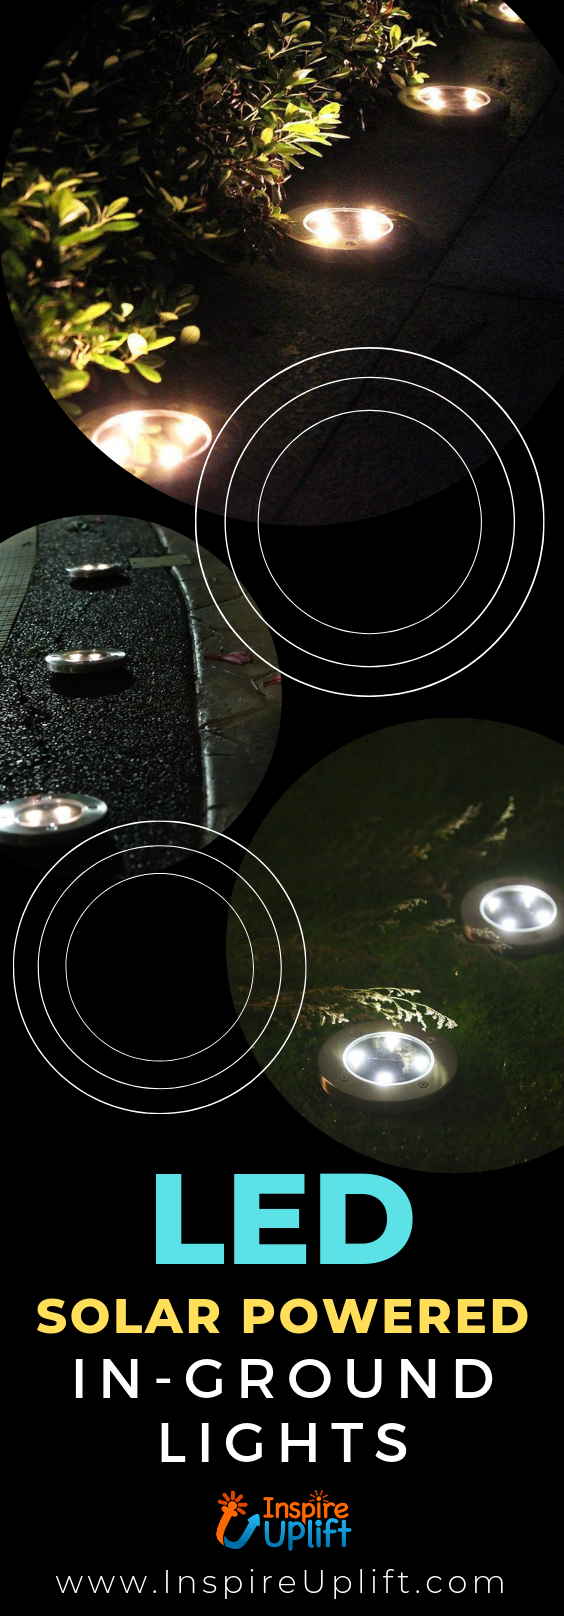 LED Solar Powered In-Ground Lights 😍 InspireUplift.com